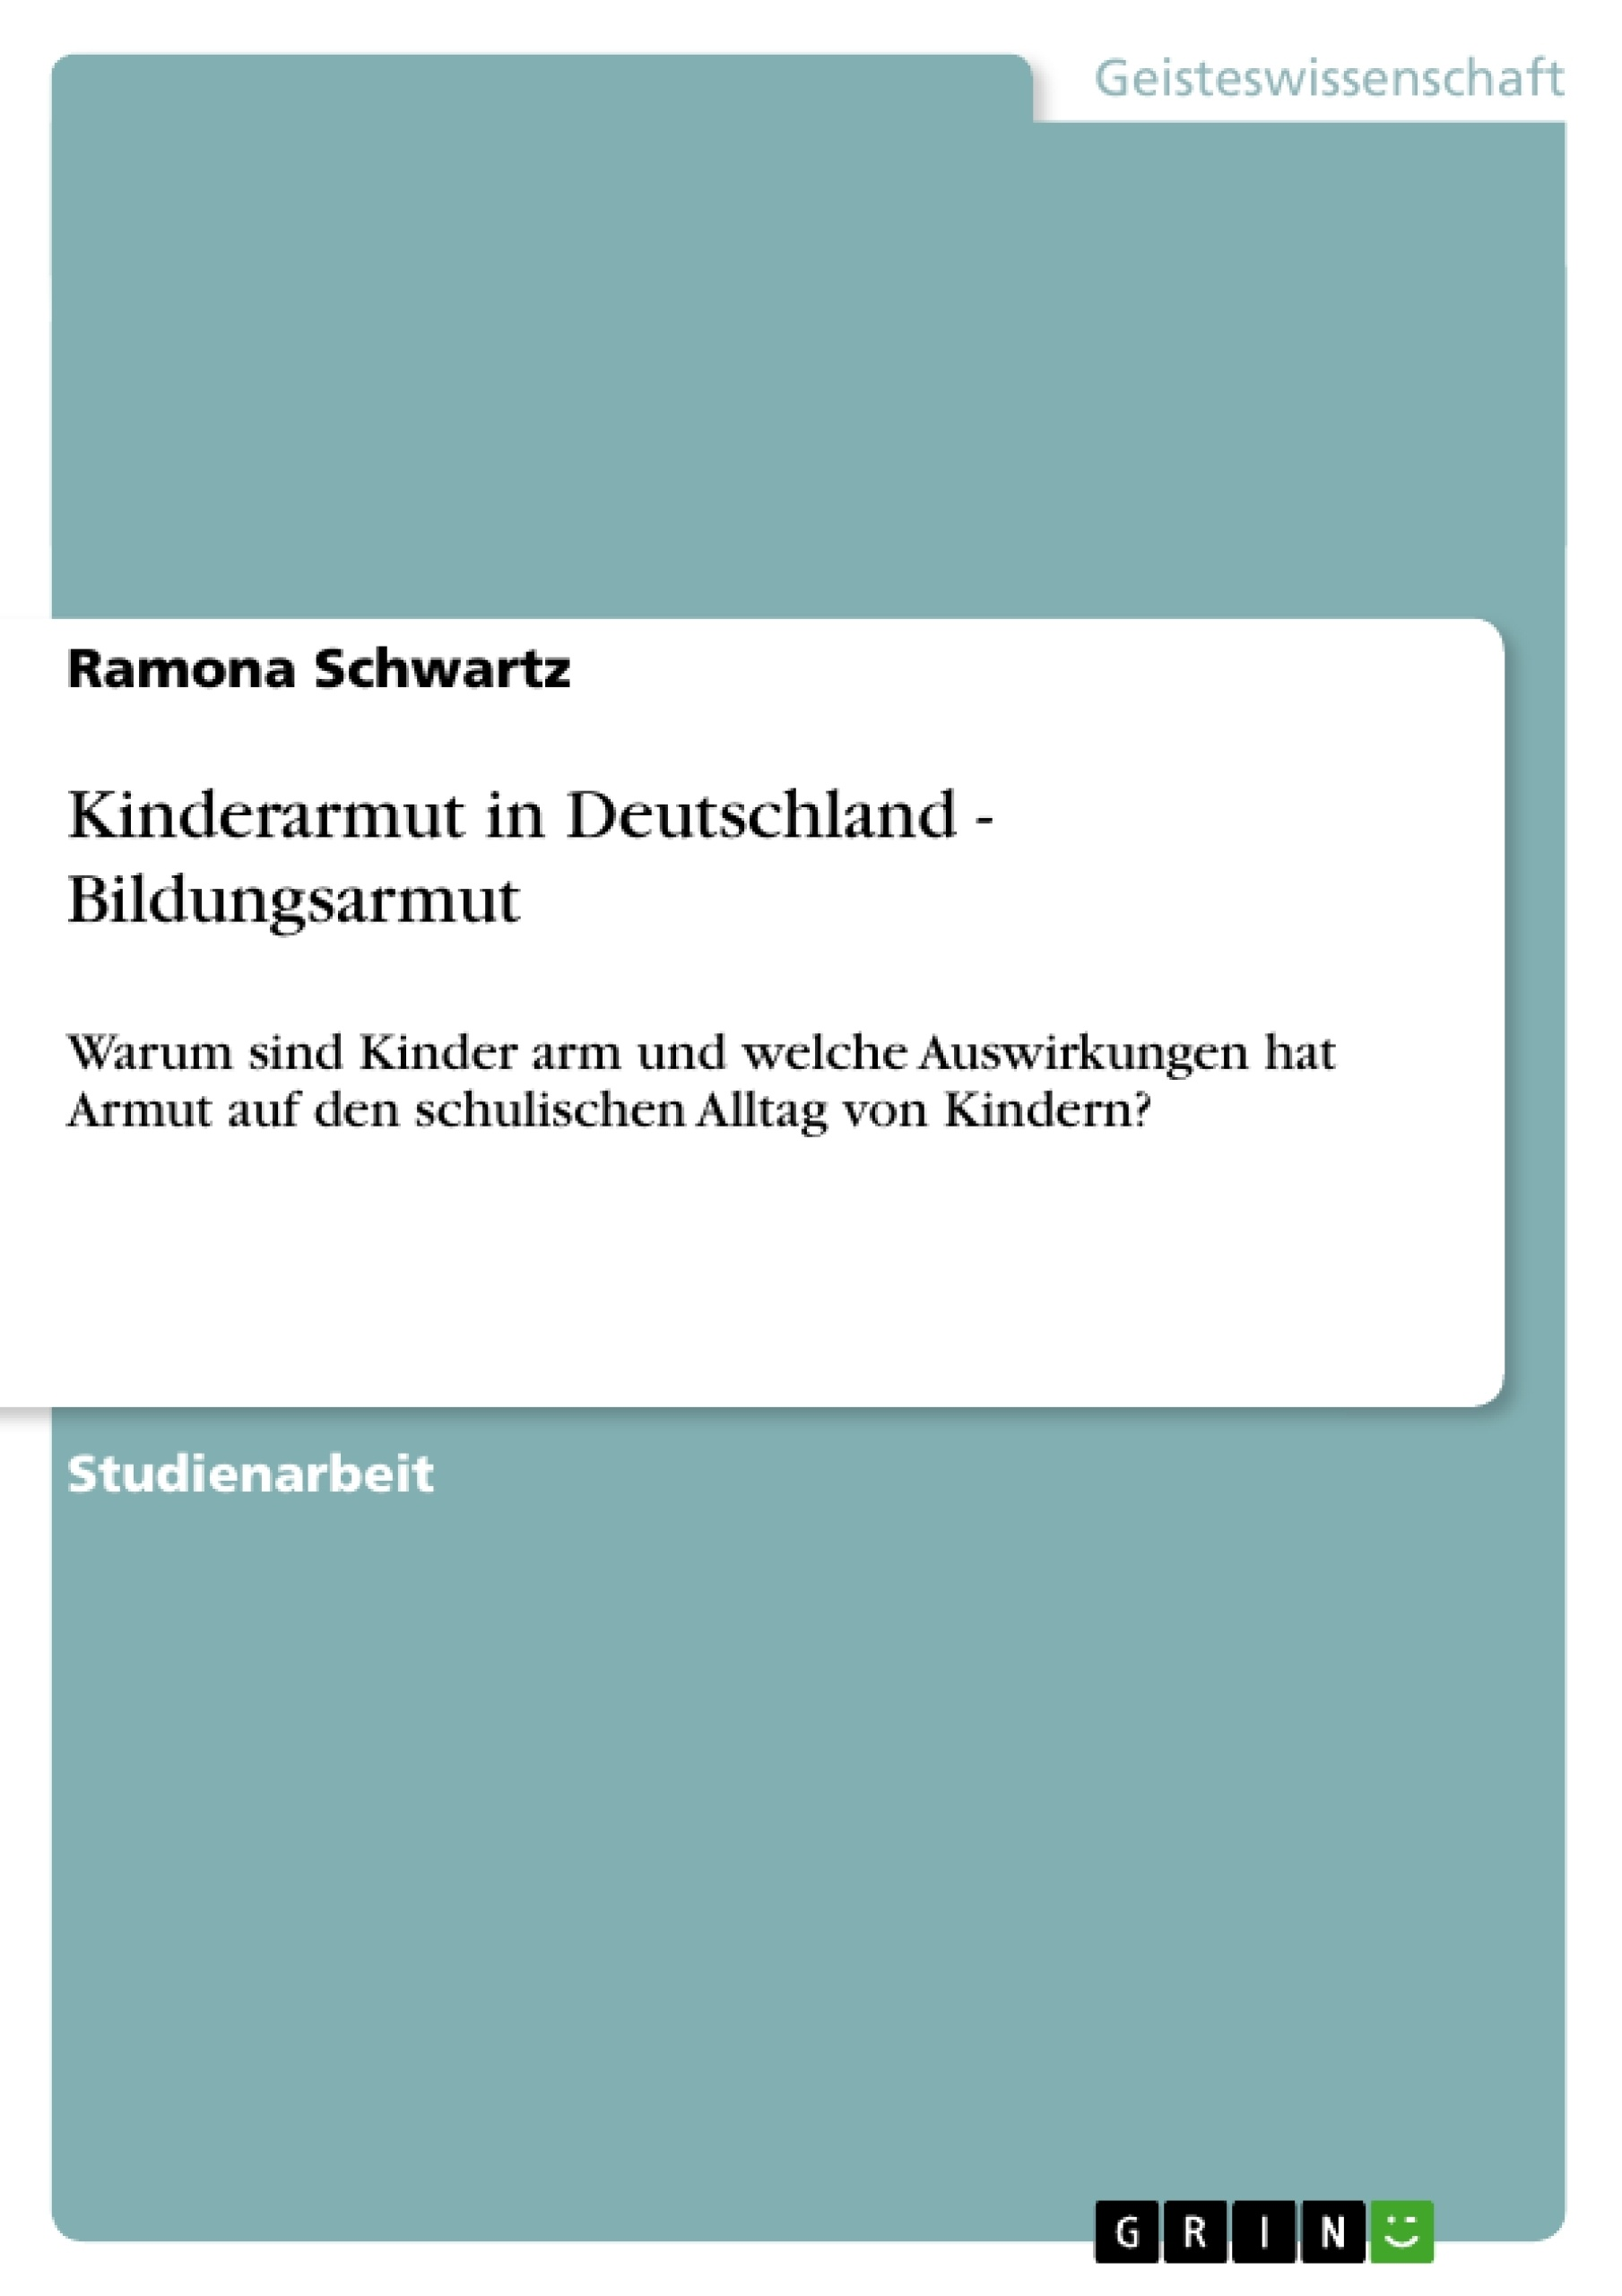 Titel: Kinderarmut in Deutschland - Bildungsarmut